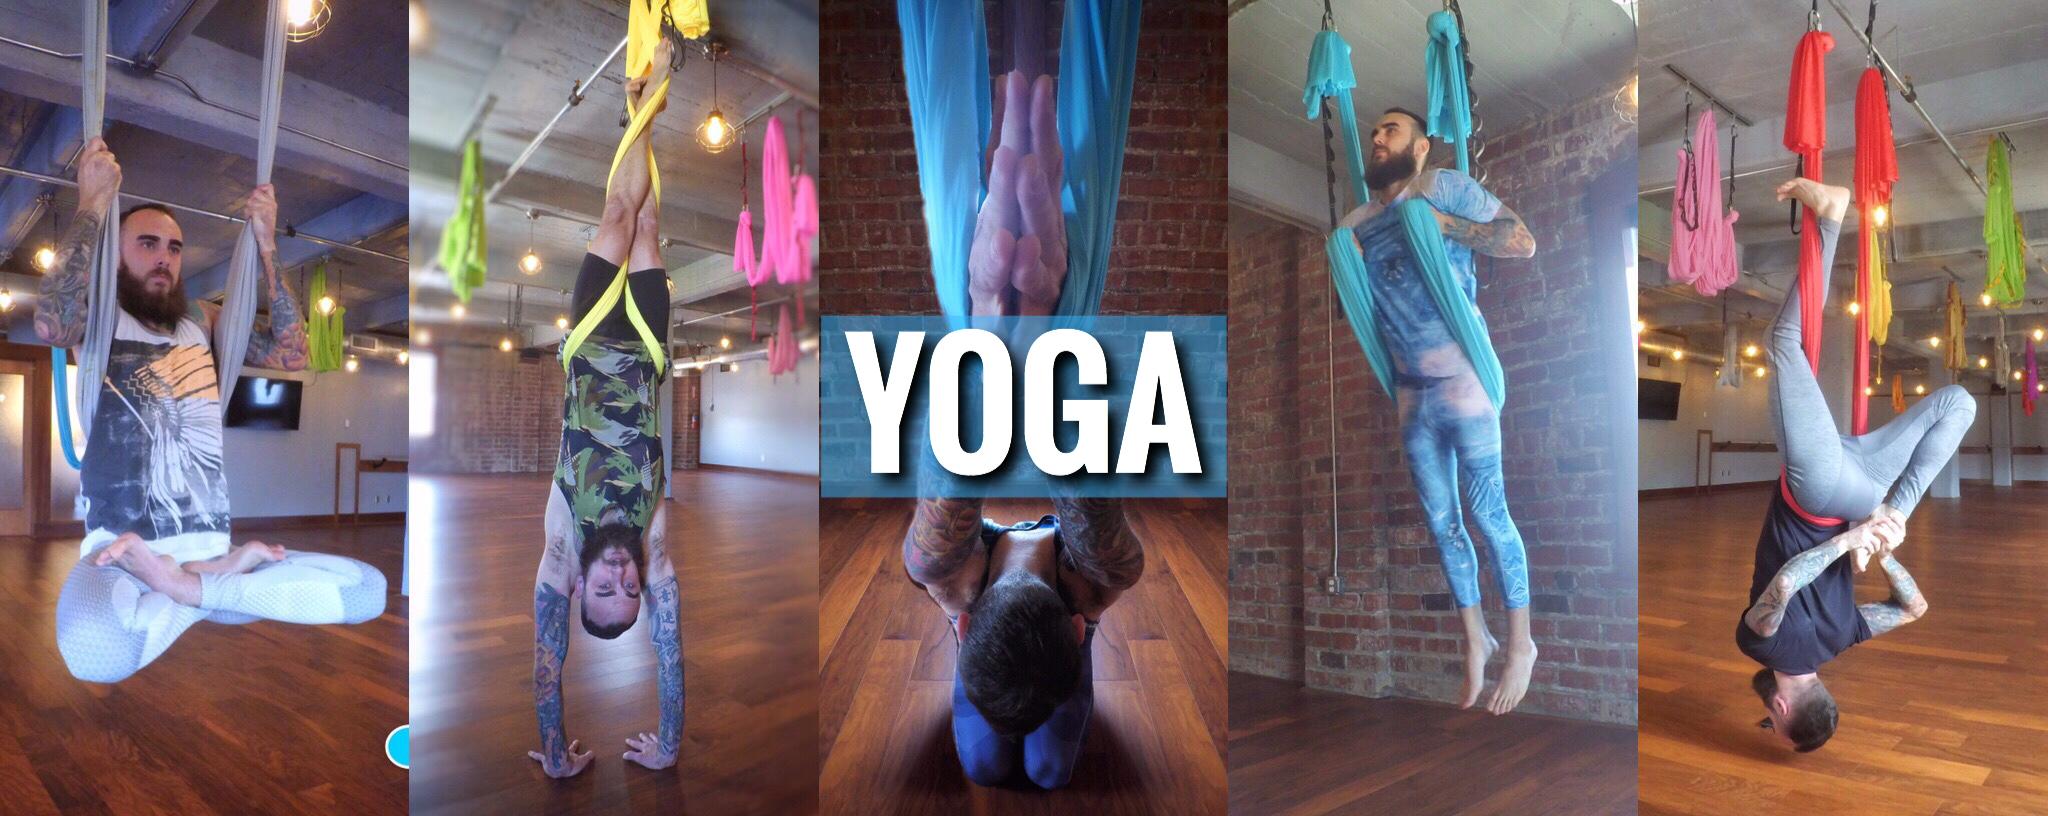 yoga-banner.JPG